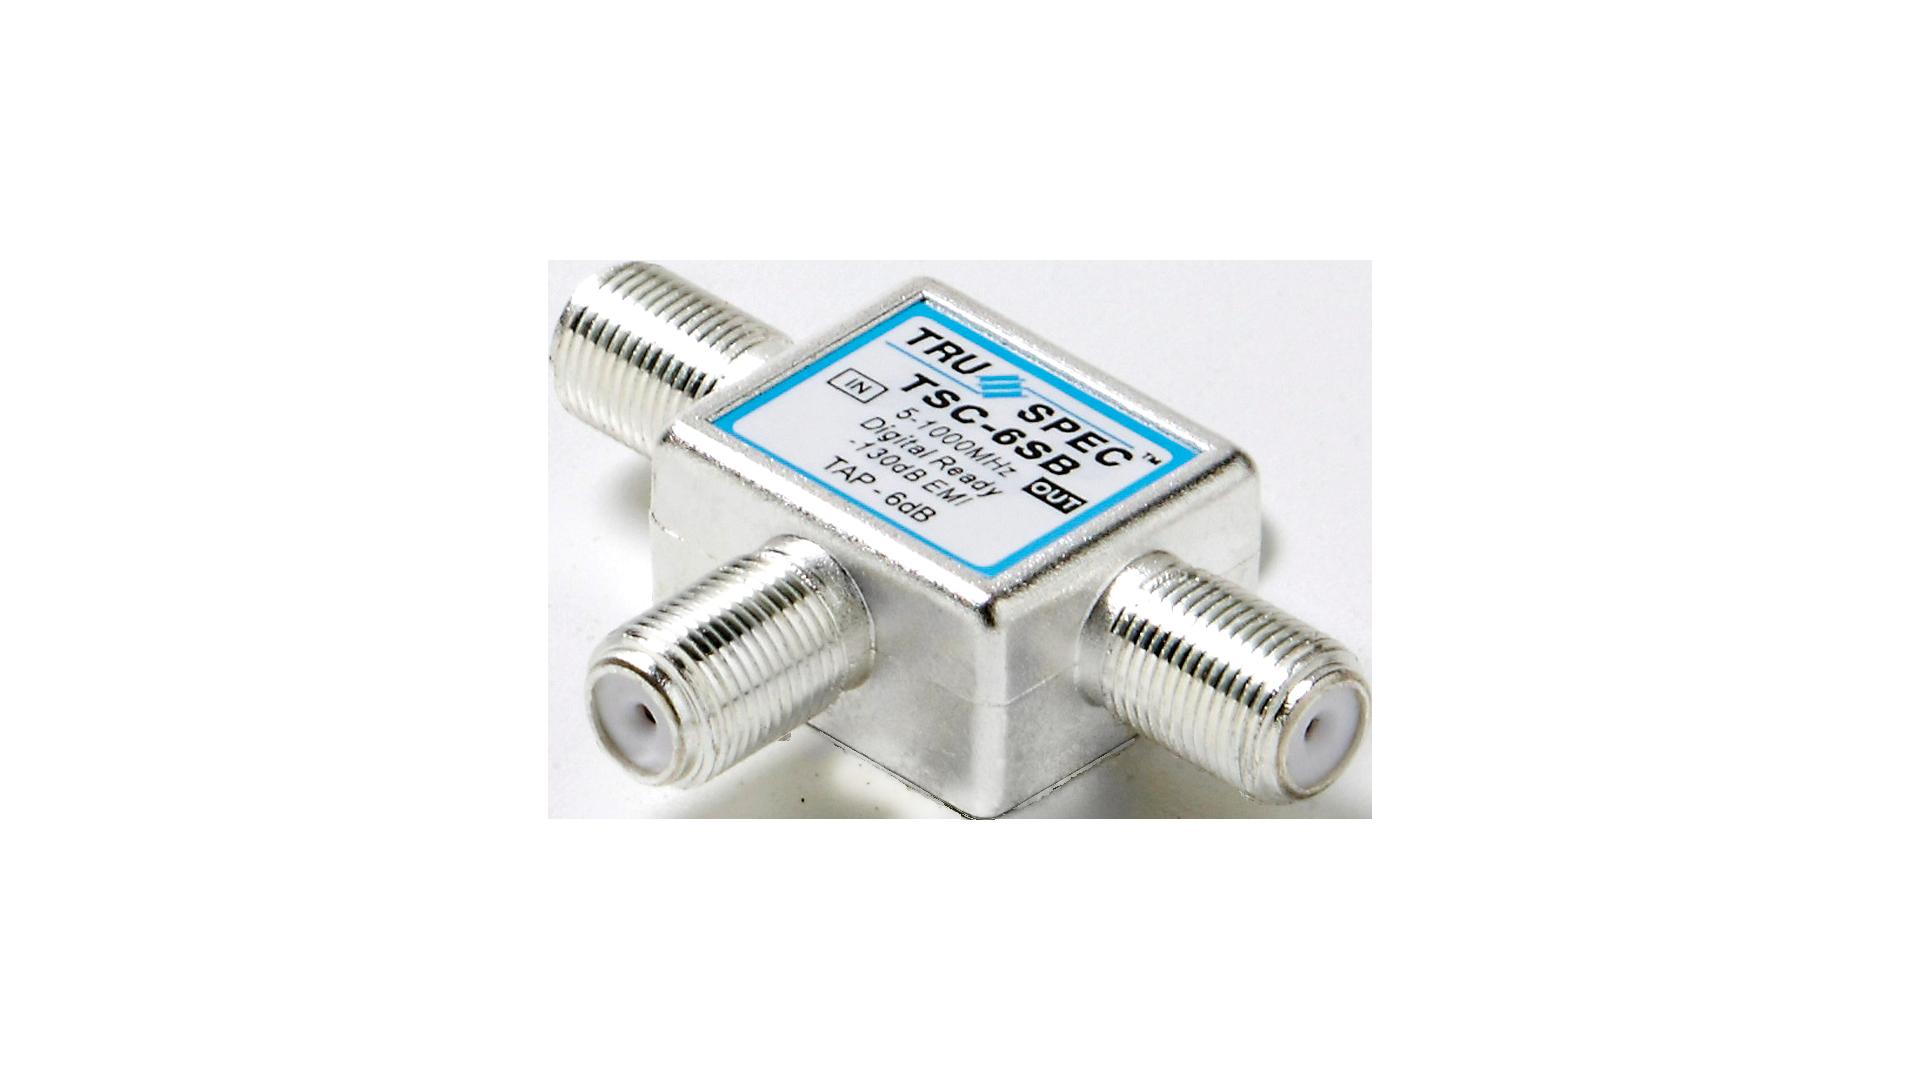 TSC-SB: 1-Port Directional Coupler